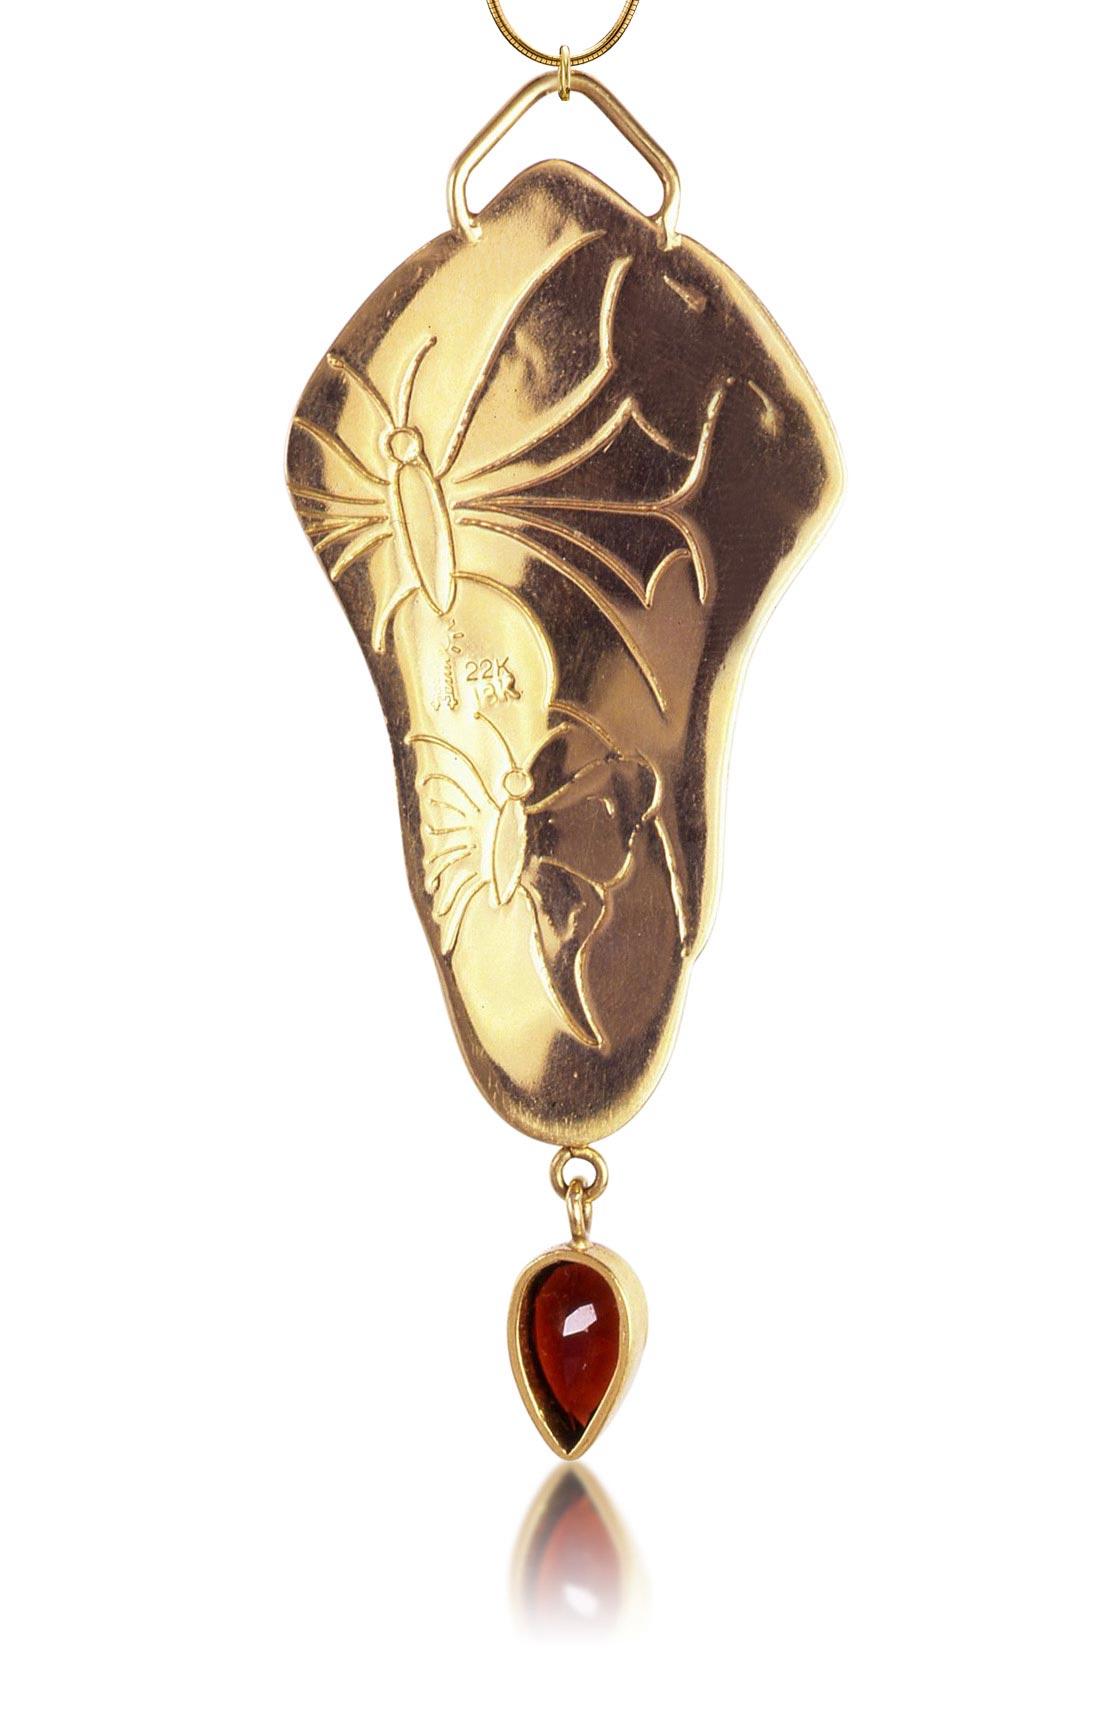 Cloisonne Jewelry | Lune Necklace | Enamel Jewelry by Patsy Croft